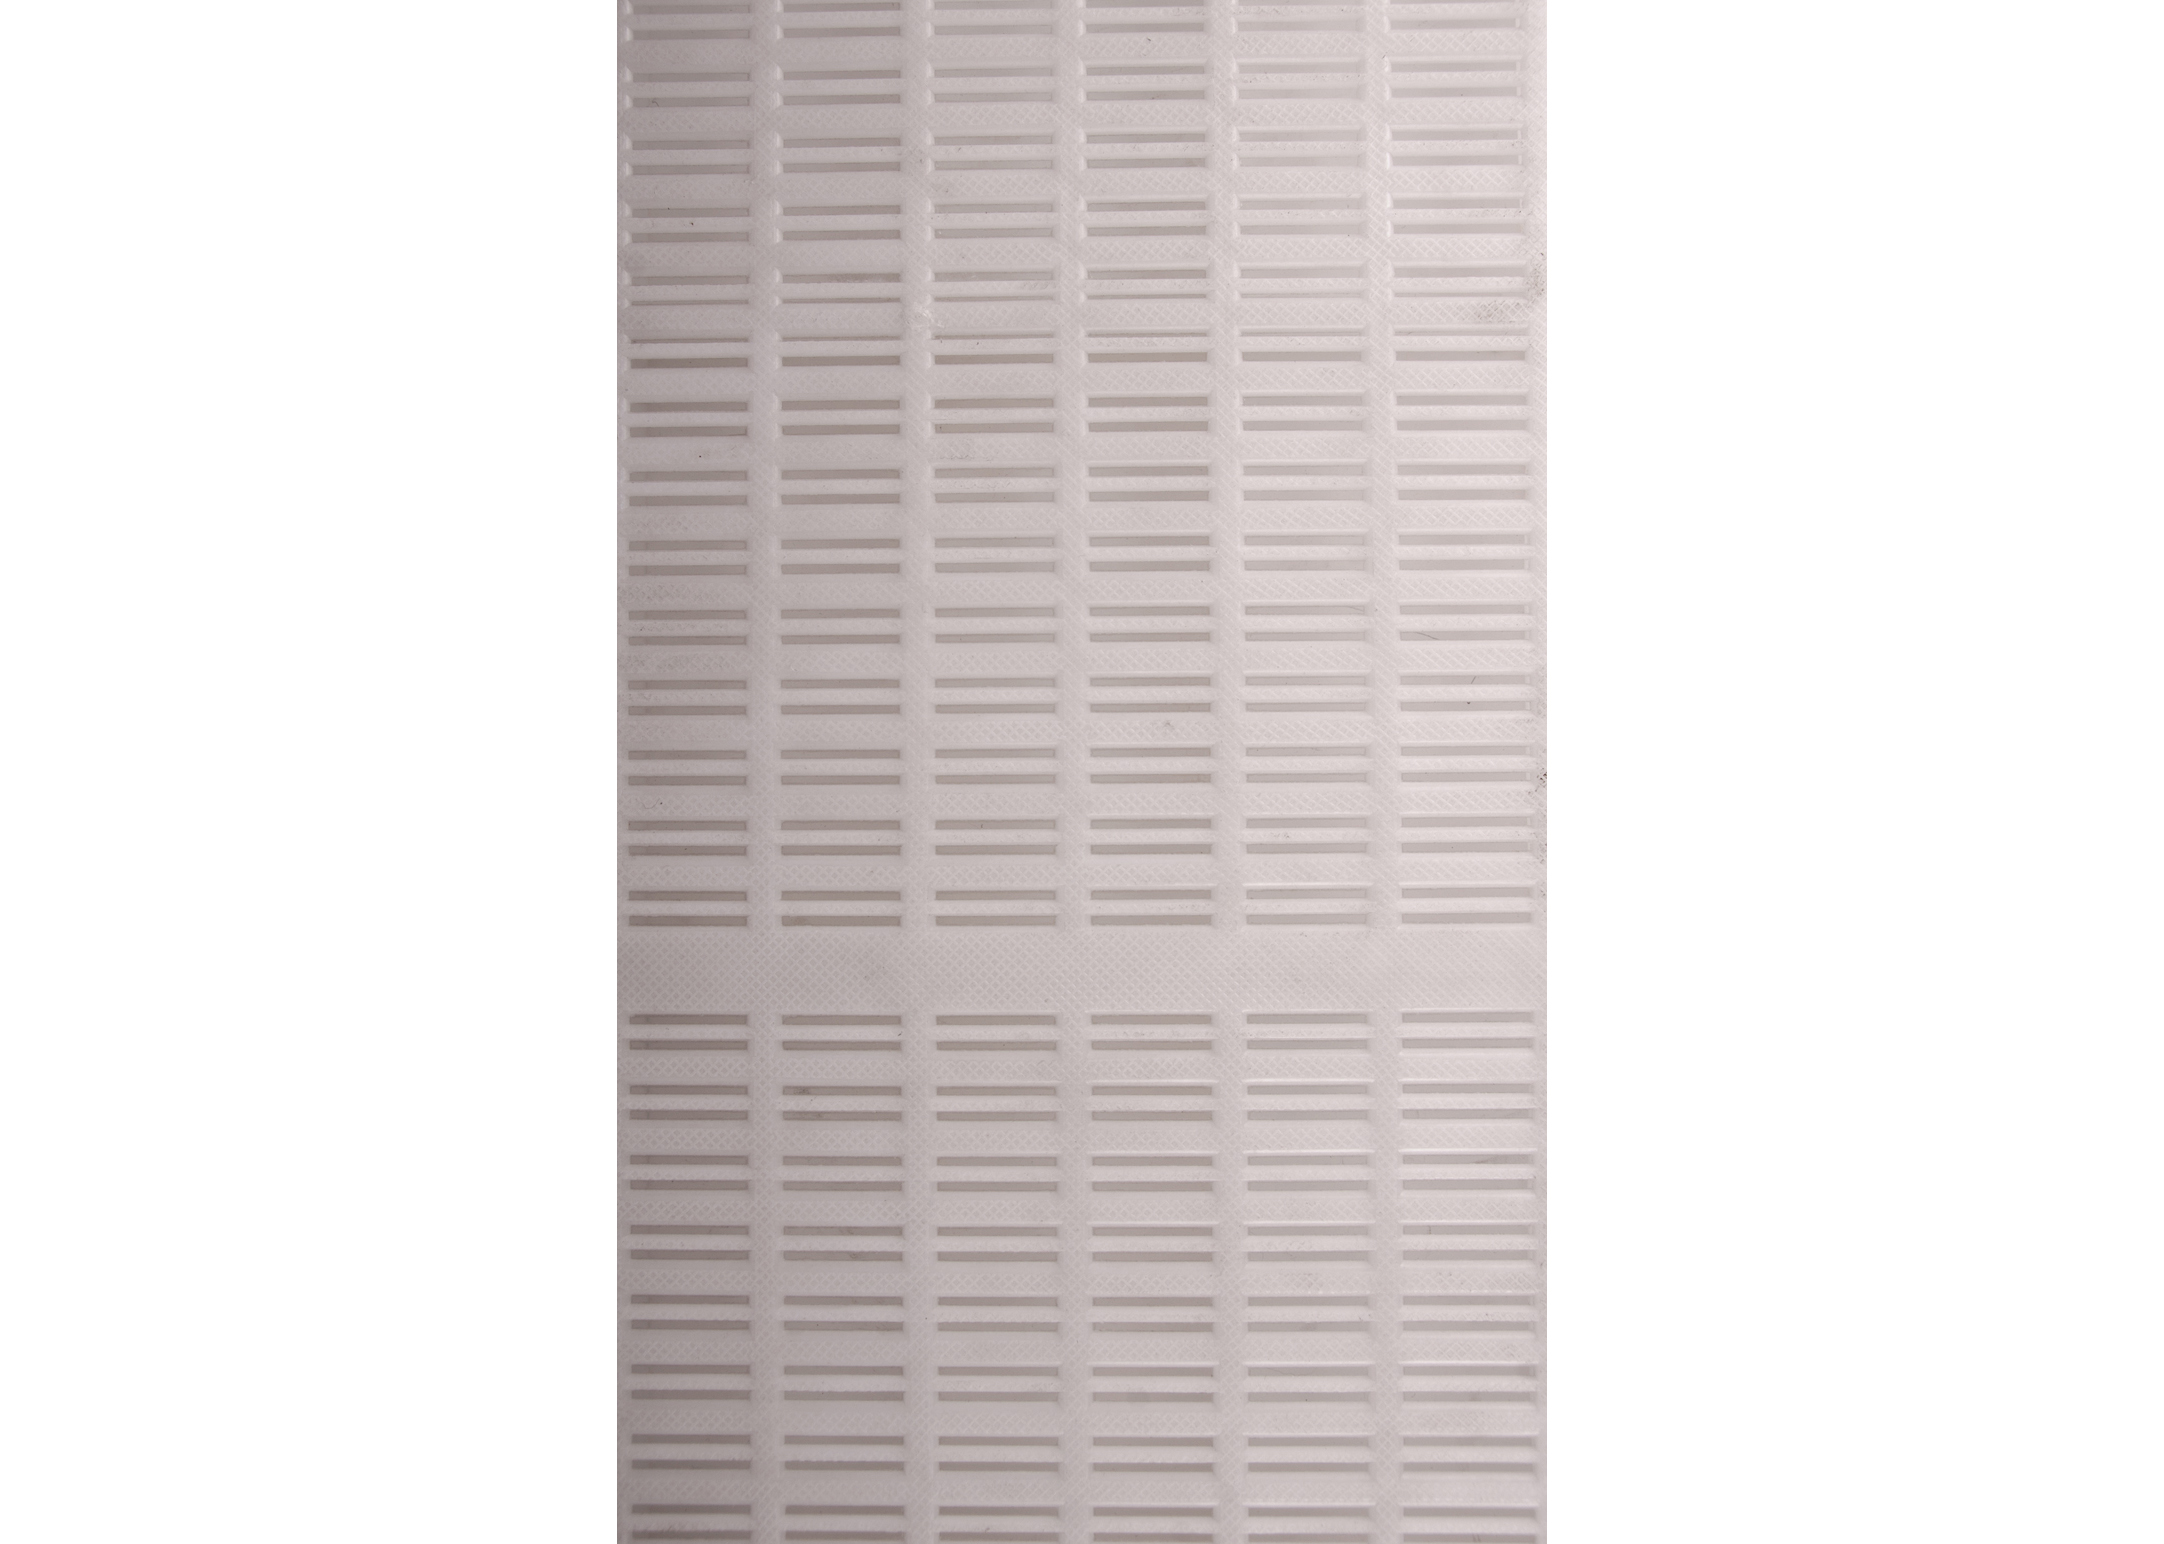 Groom-X Bath Grid PVC 30cm x 60cm